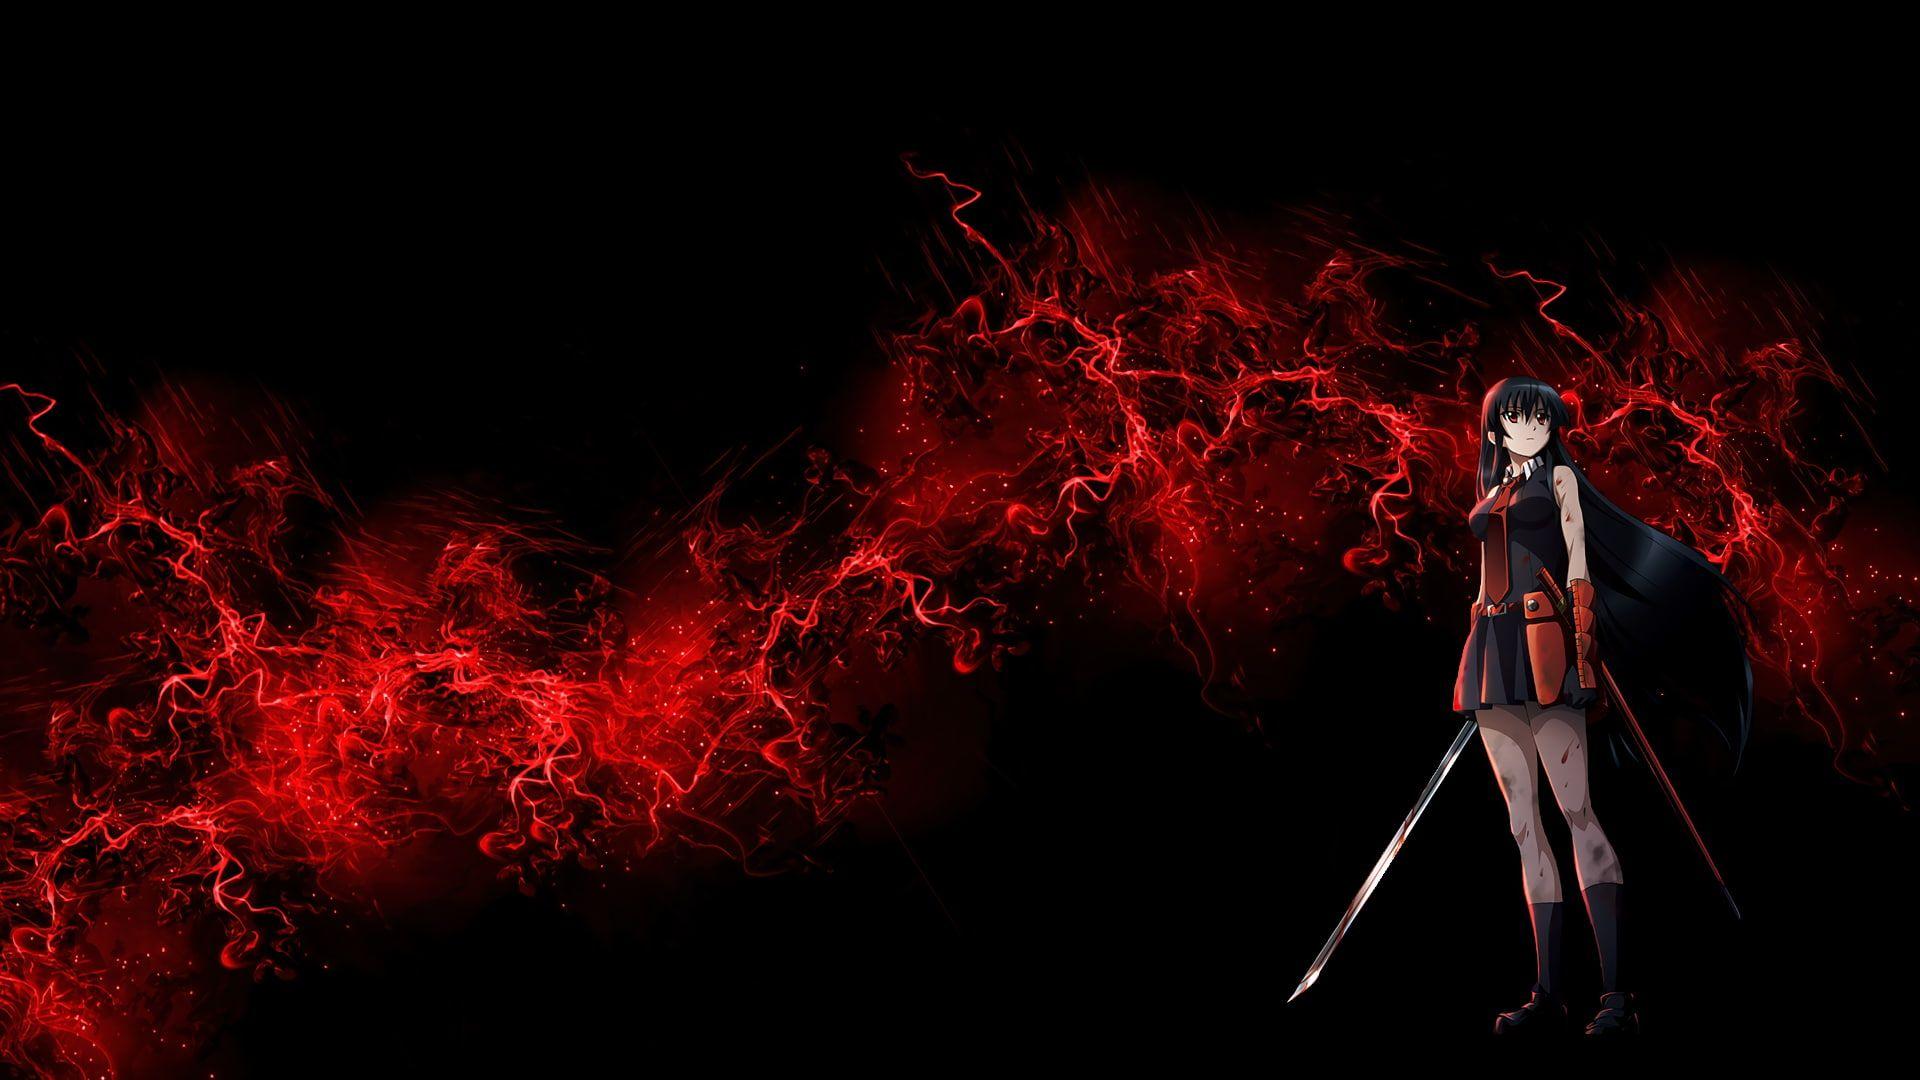 Akame Ga Kill Akame 1080p Wallpaper Hdwallpaper Desktop In 2020 Akame Ga Akame Ga Kill Background Pictures